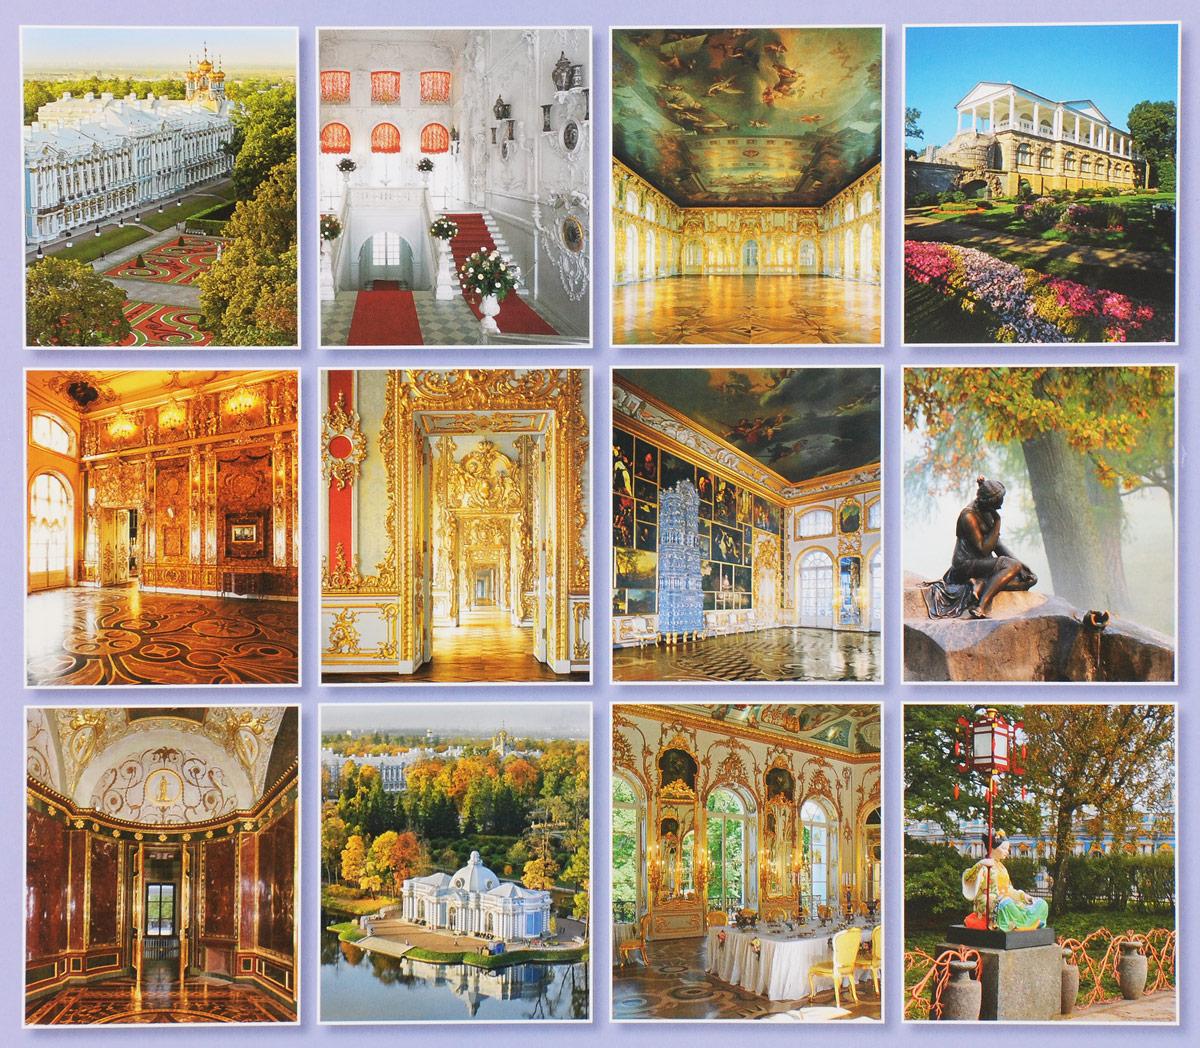 Календарь 2017 (на спирали). Царское село. Дворцы и парки / Tsarskoye Selo: Palaces and Parks